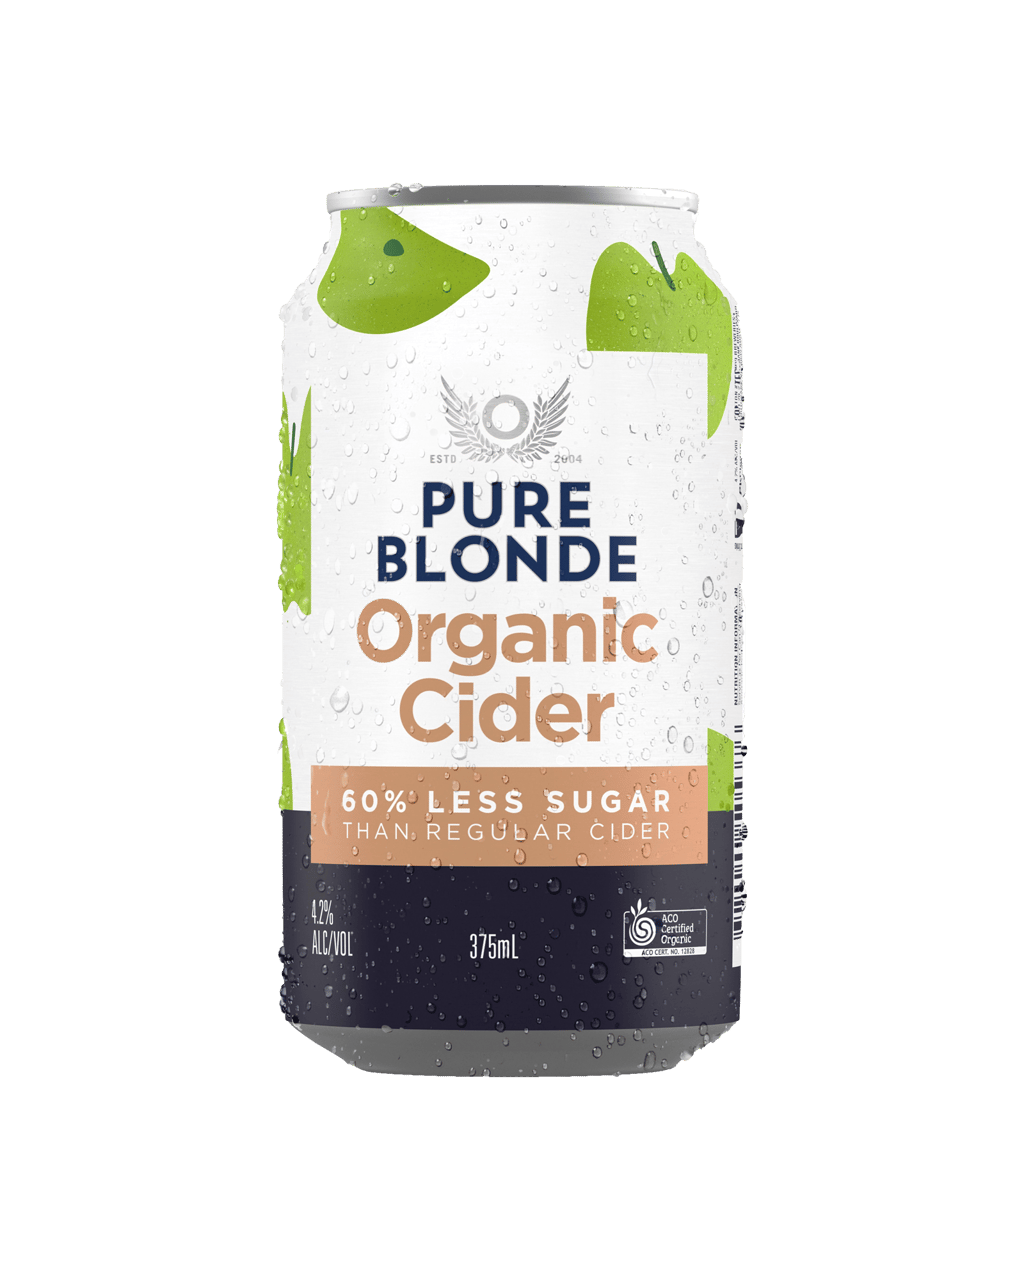 Buy Pure Blonde Organic Apple Cider 375mL Cans | Dan Murphy's